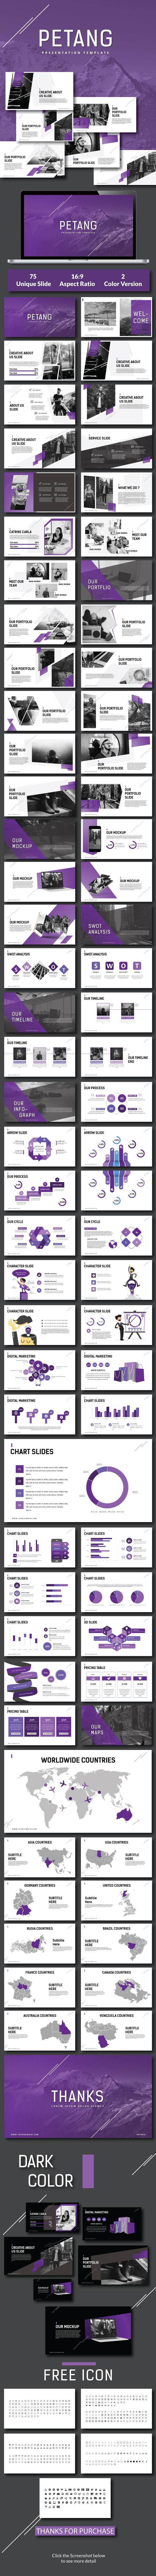 Petang - Creative Keynote Template - Keynote Templates Presentation Templates